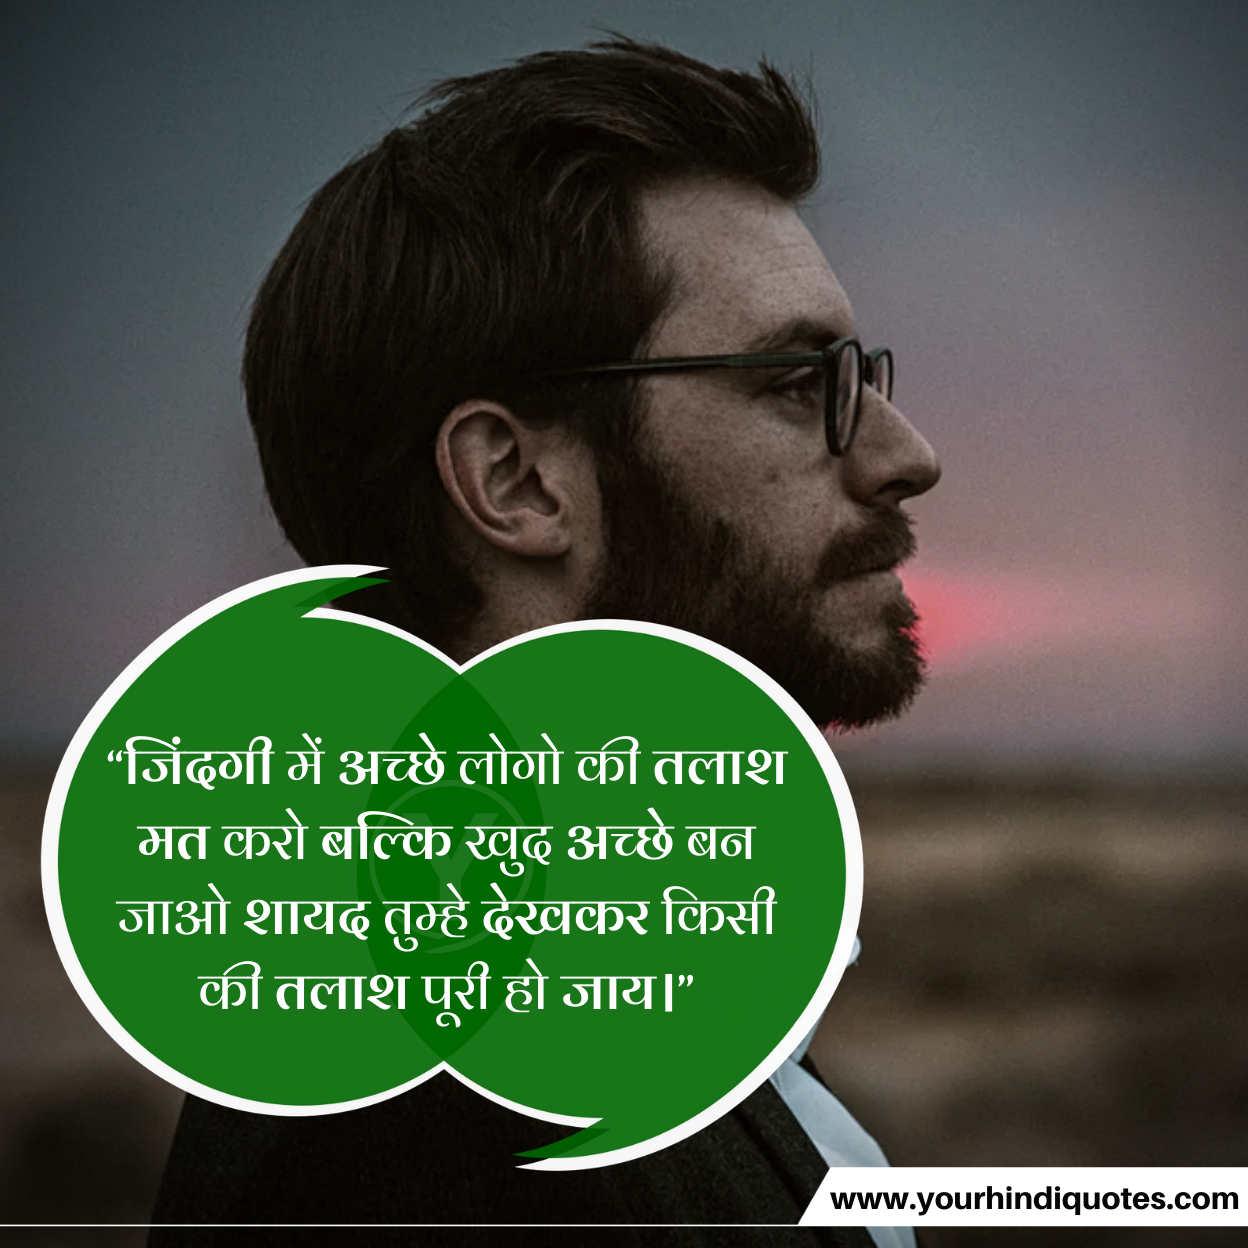 Motivational Thoughts Hindi Pics